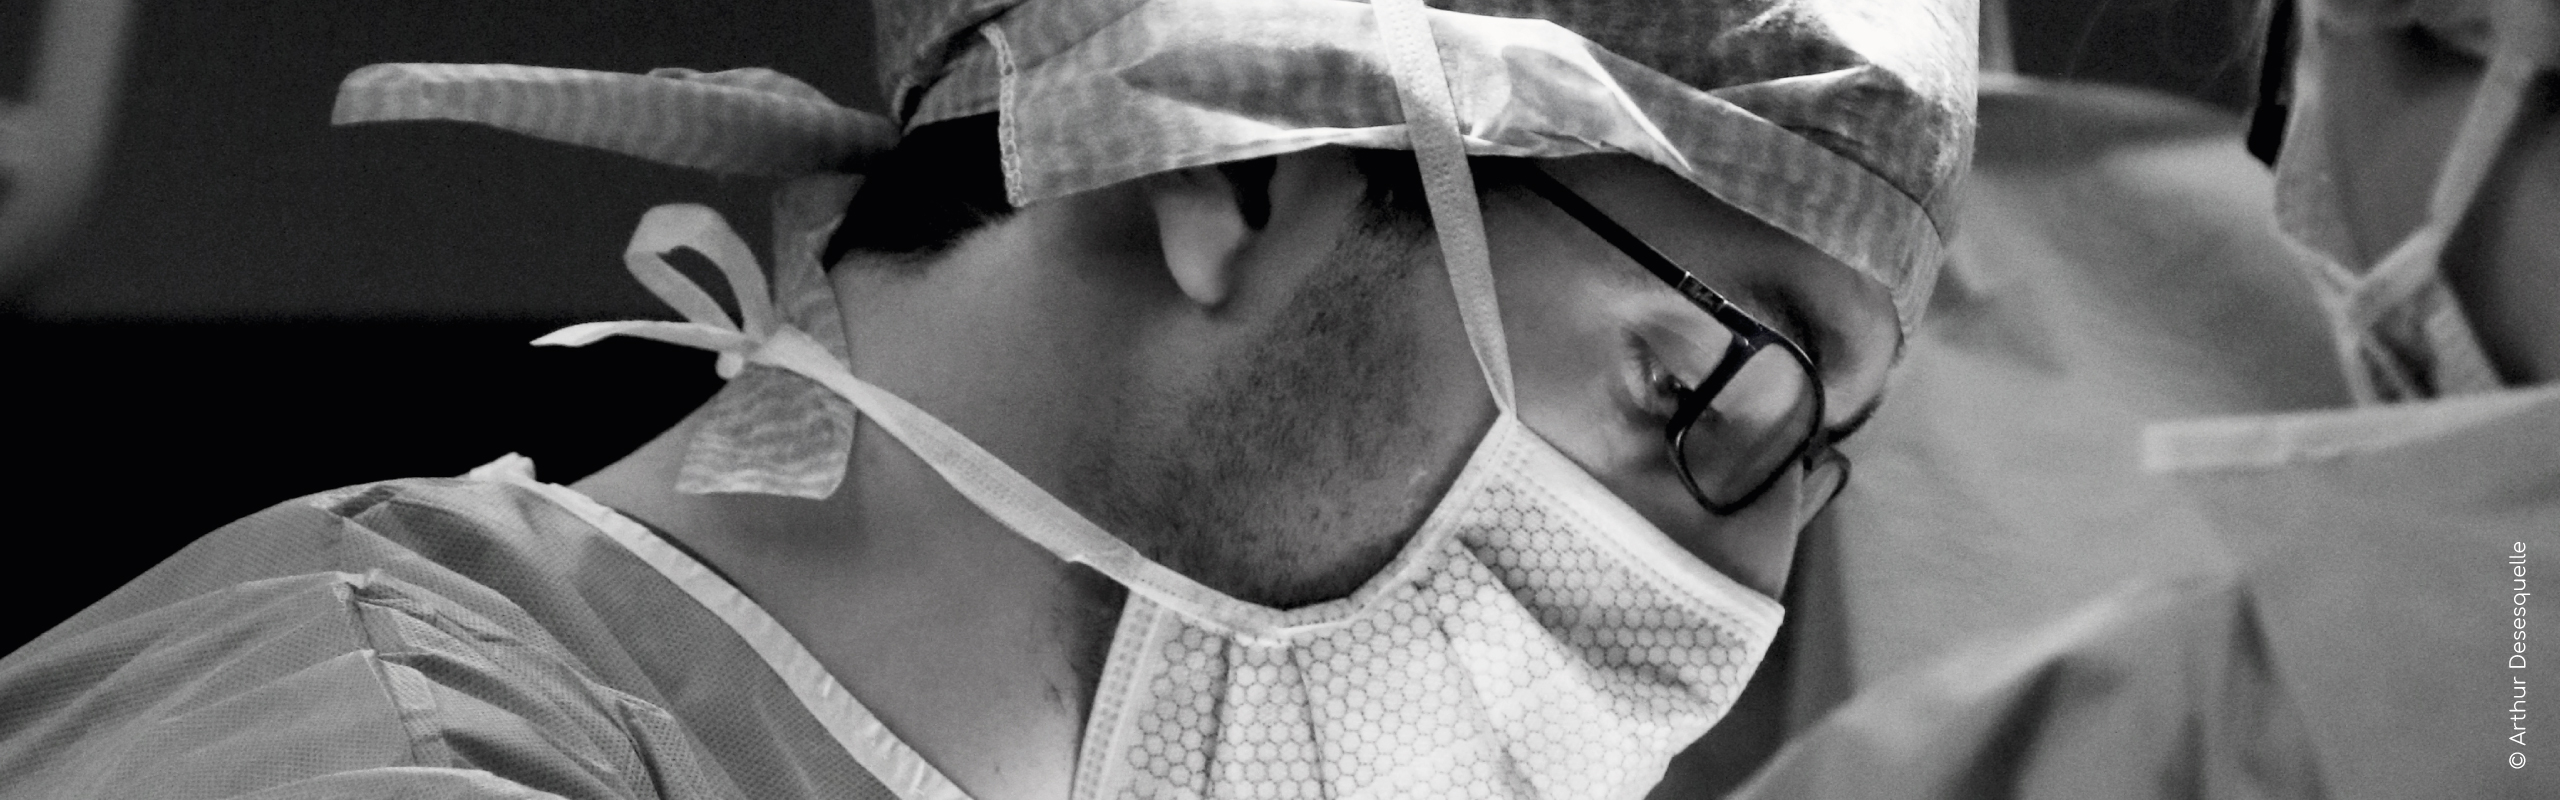 Service de chirurgie Digestive & Viscérale du CHBA